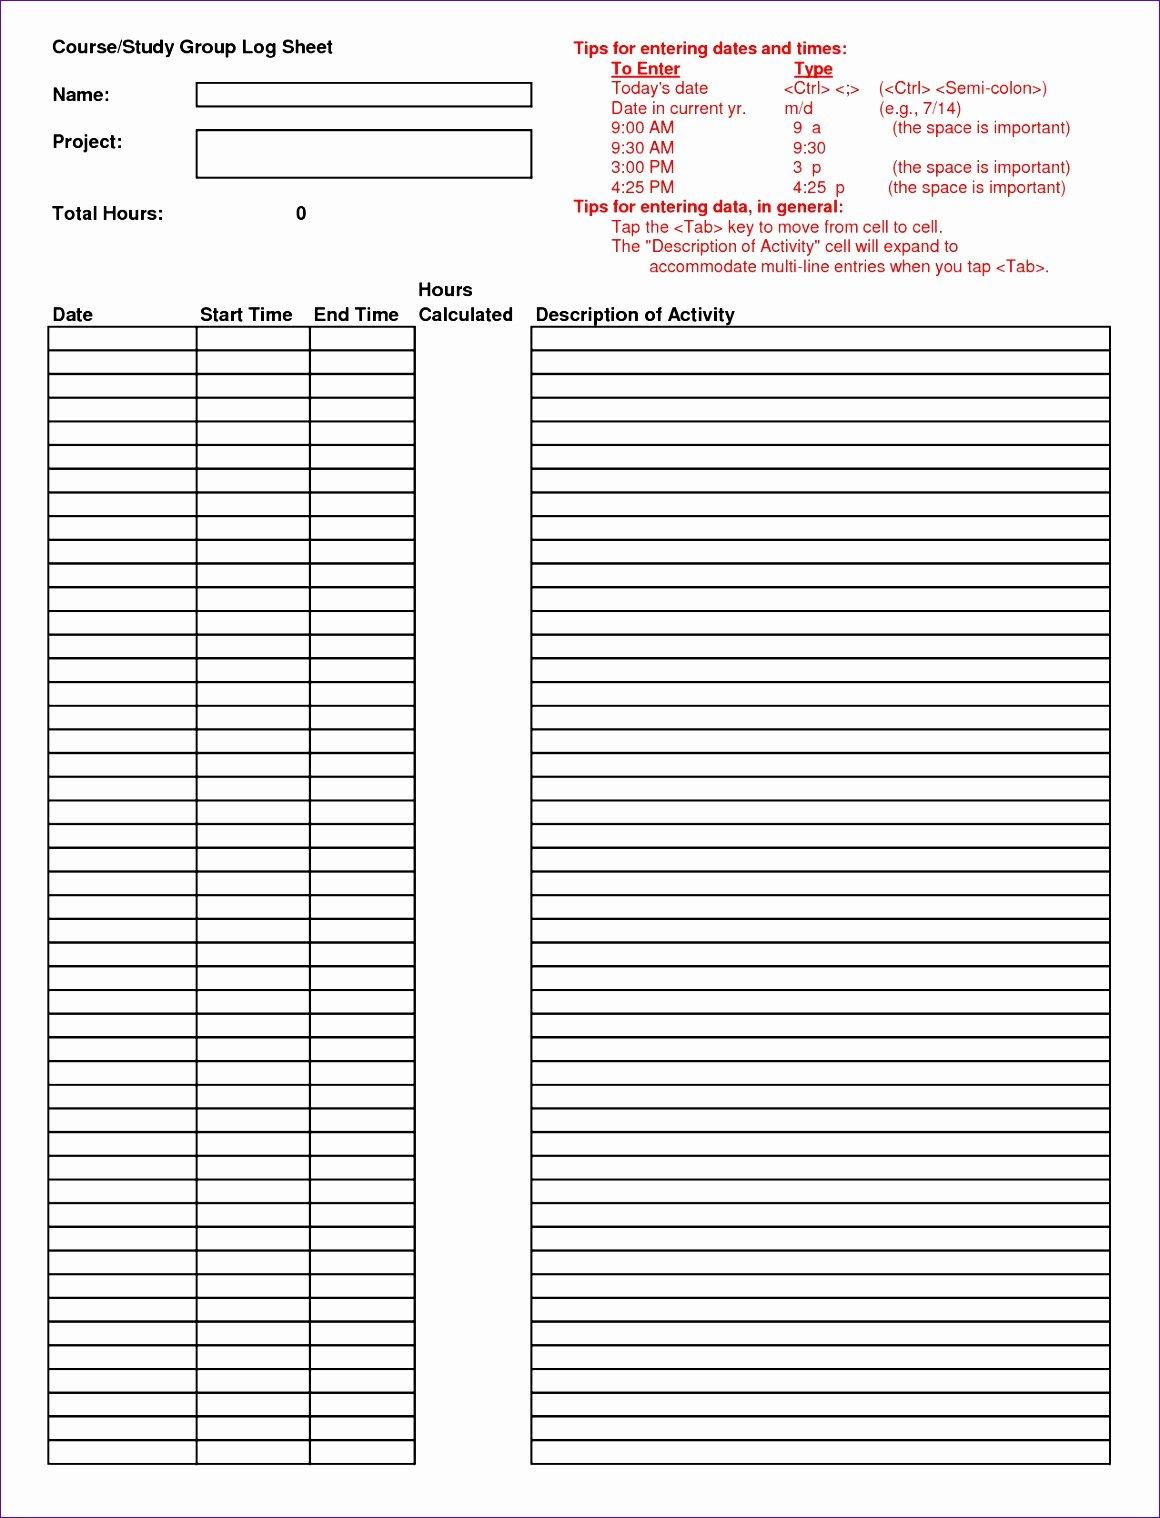 Log Sheet Template Excel Best Of 14 Log Sheet Template Excel Exceltemplates Exceltemplates